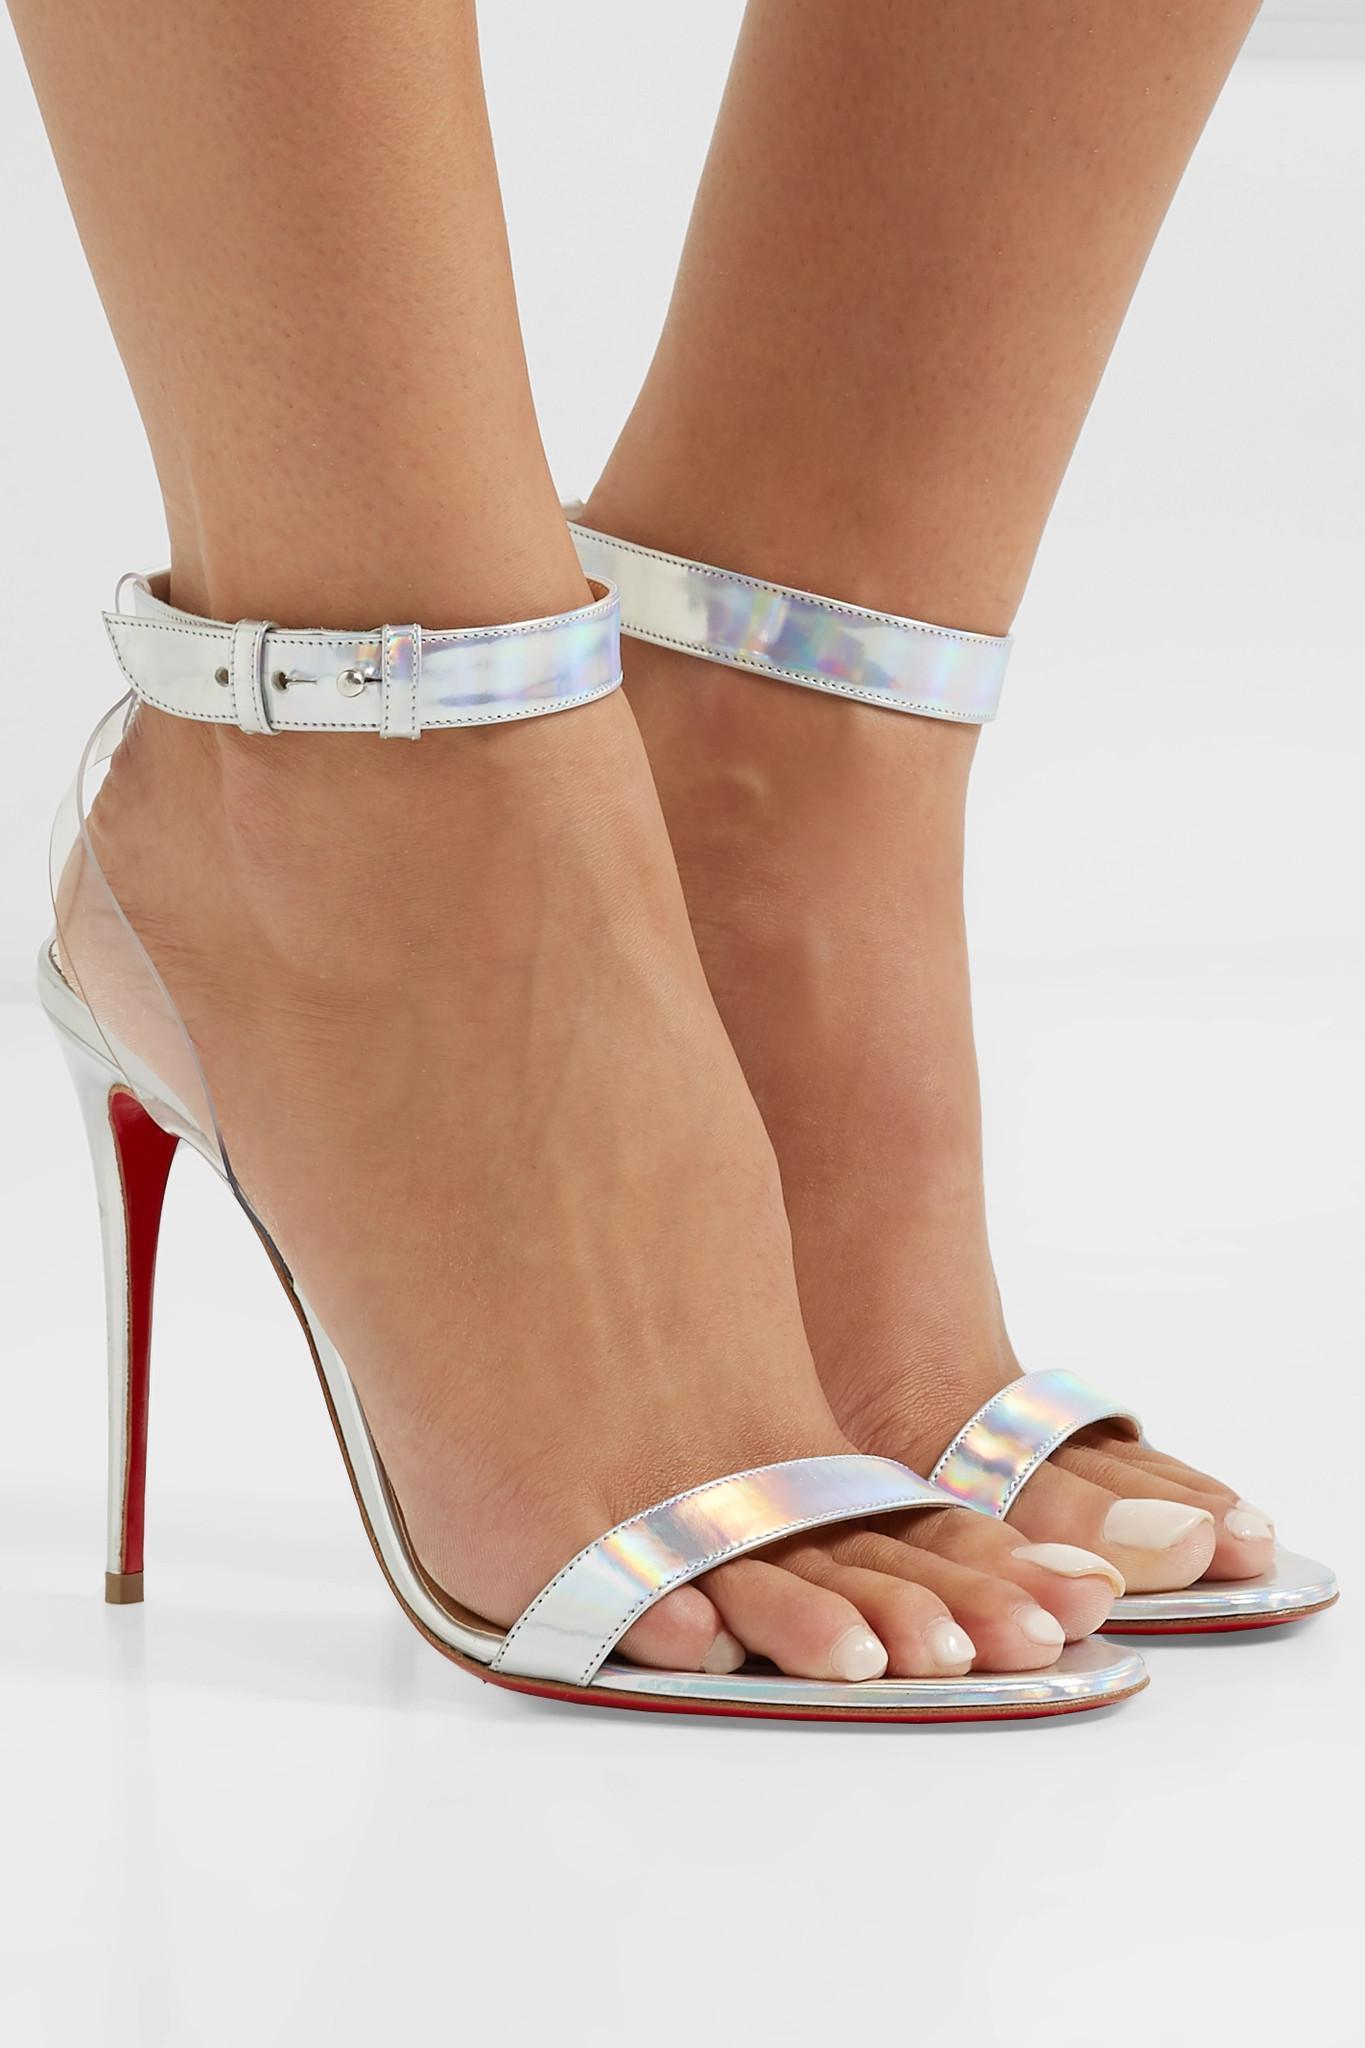 5cca4d1daae Christian Louboutin - Metallic Jonatina 100 Pvc-trimmed Iridescent Leather  Sandals - Lyst. View fullscreen